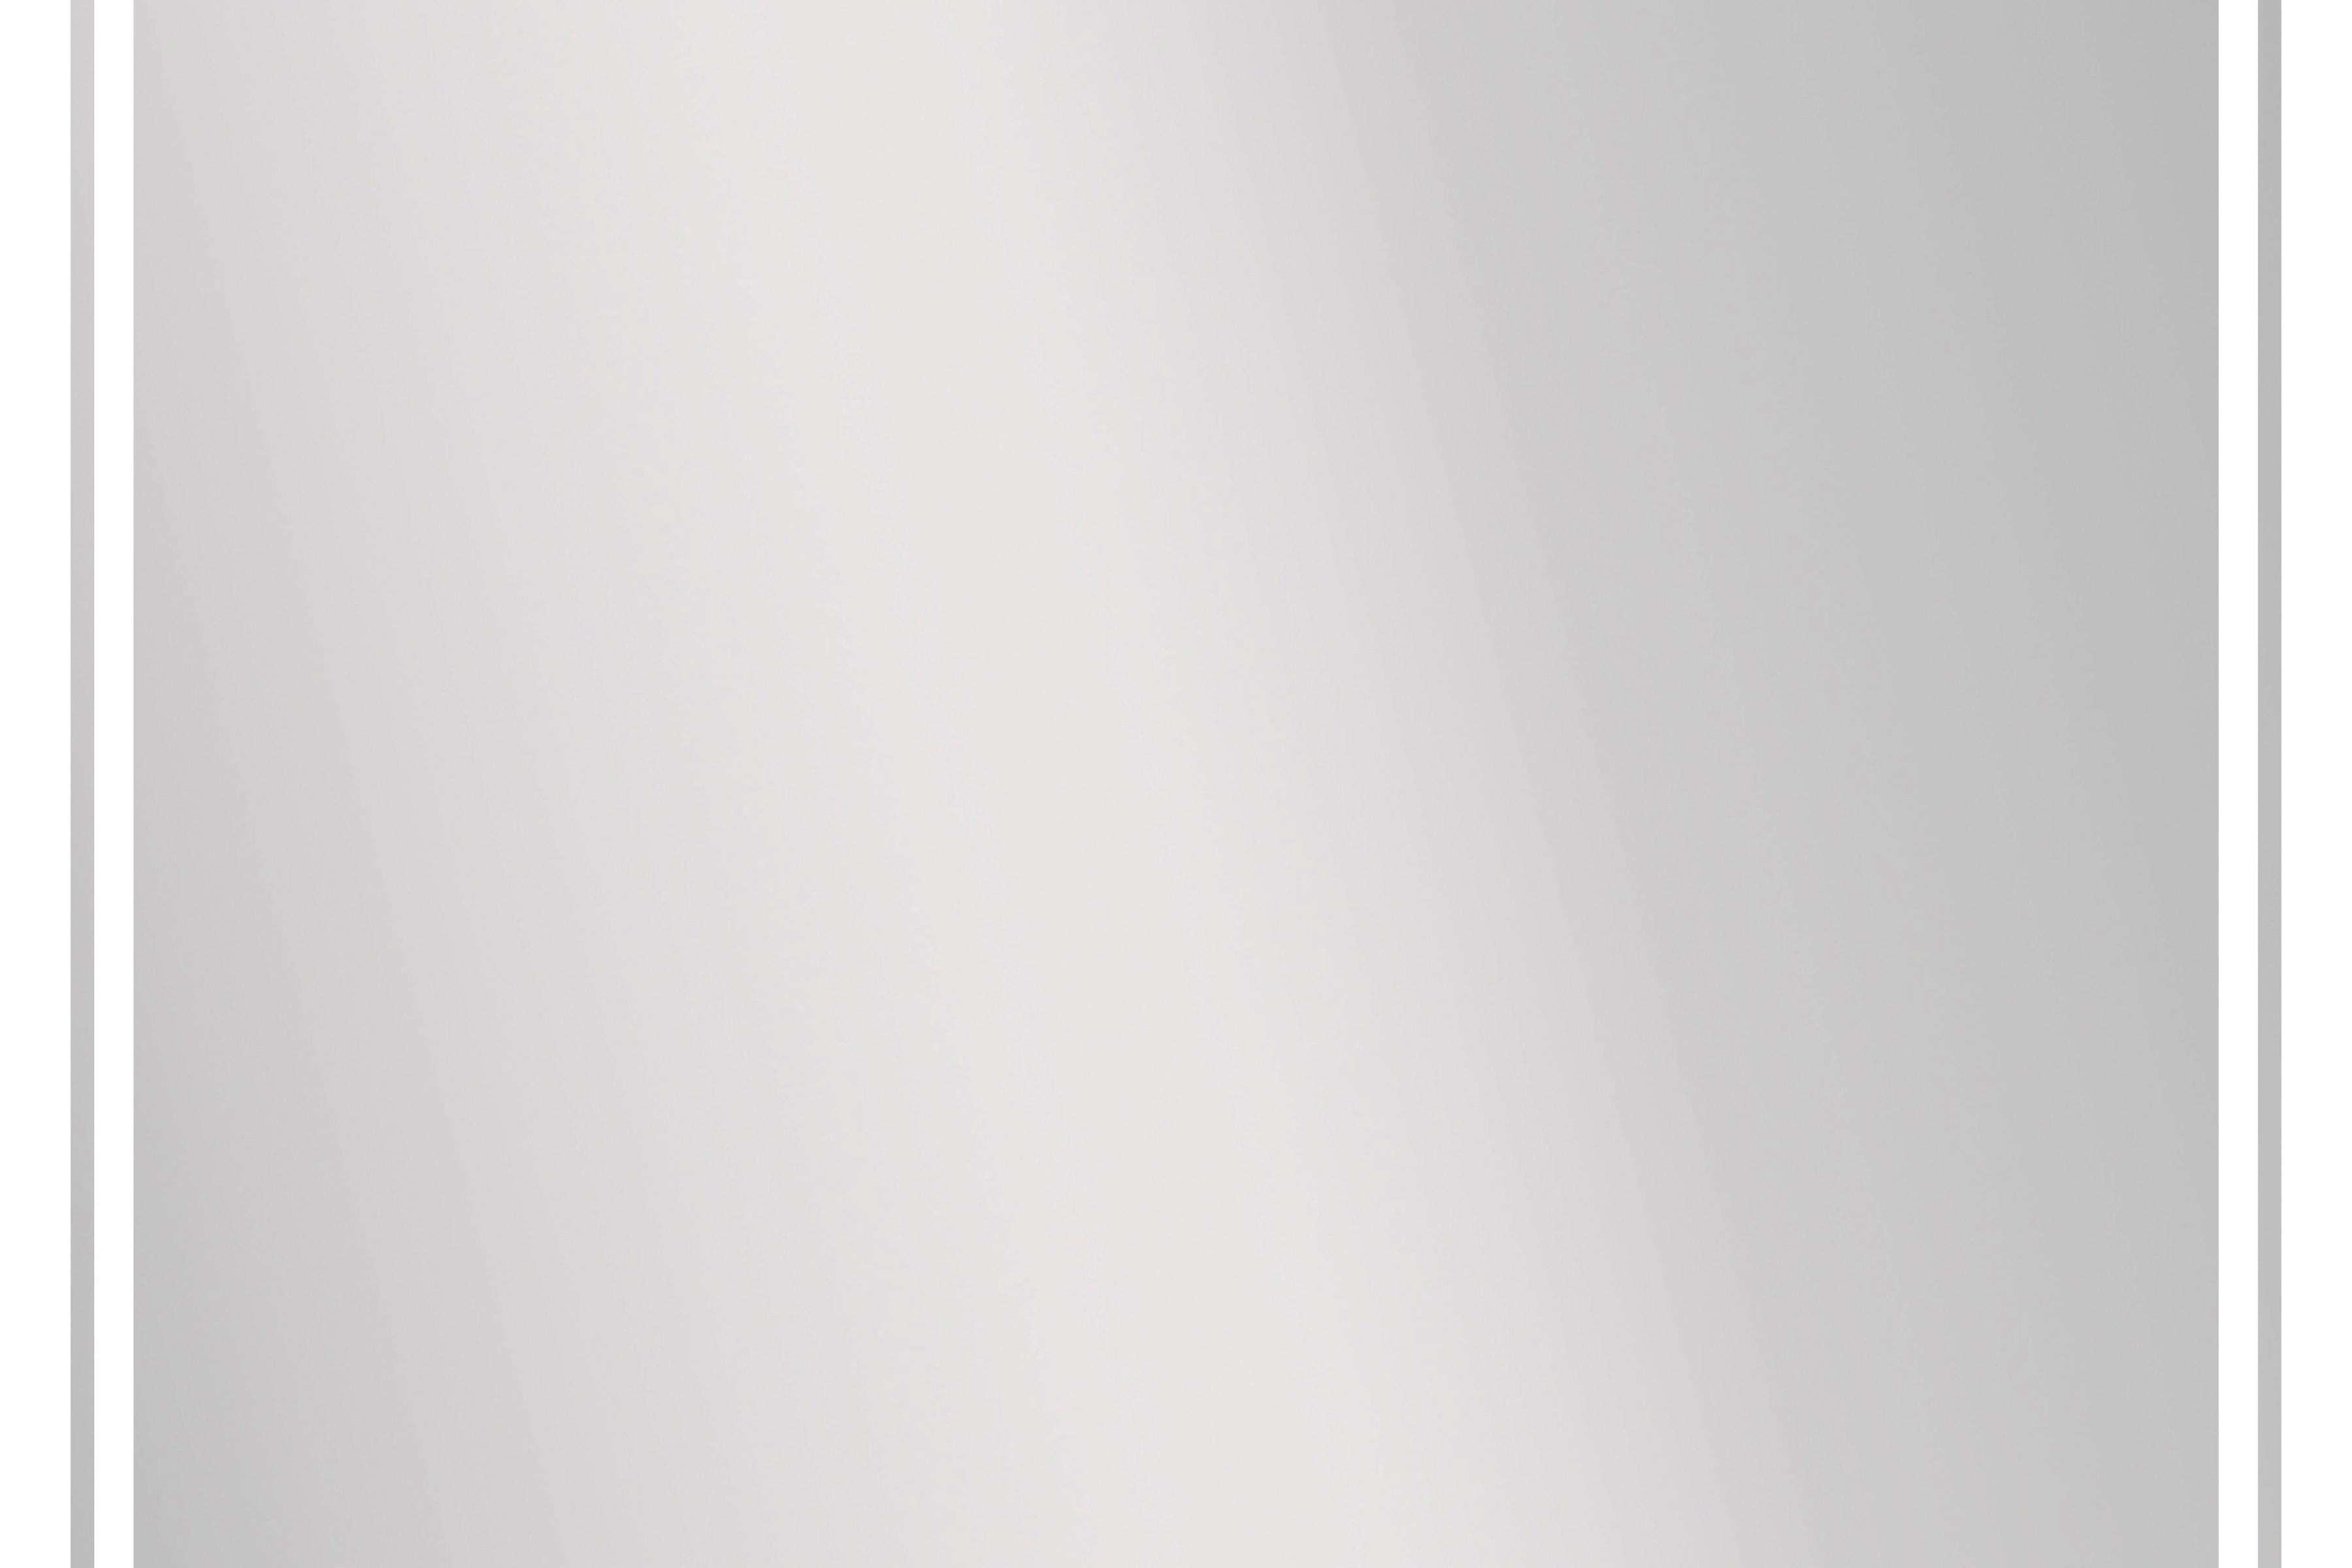 KRISTALLFORM Spiegel New Paradiso IV, 90 x 60 cm, LED   Bad > Spiegel fürs Bad   Jokey